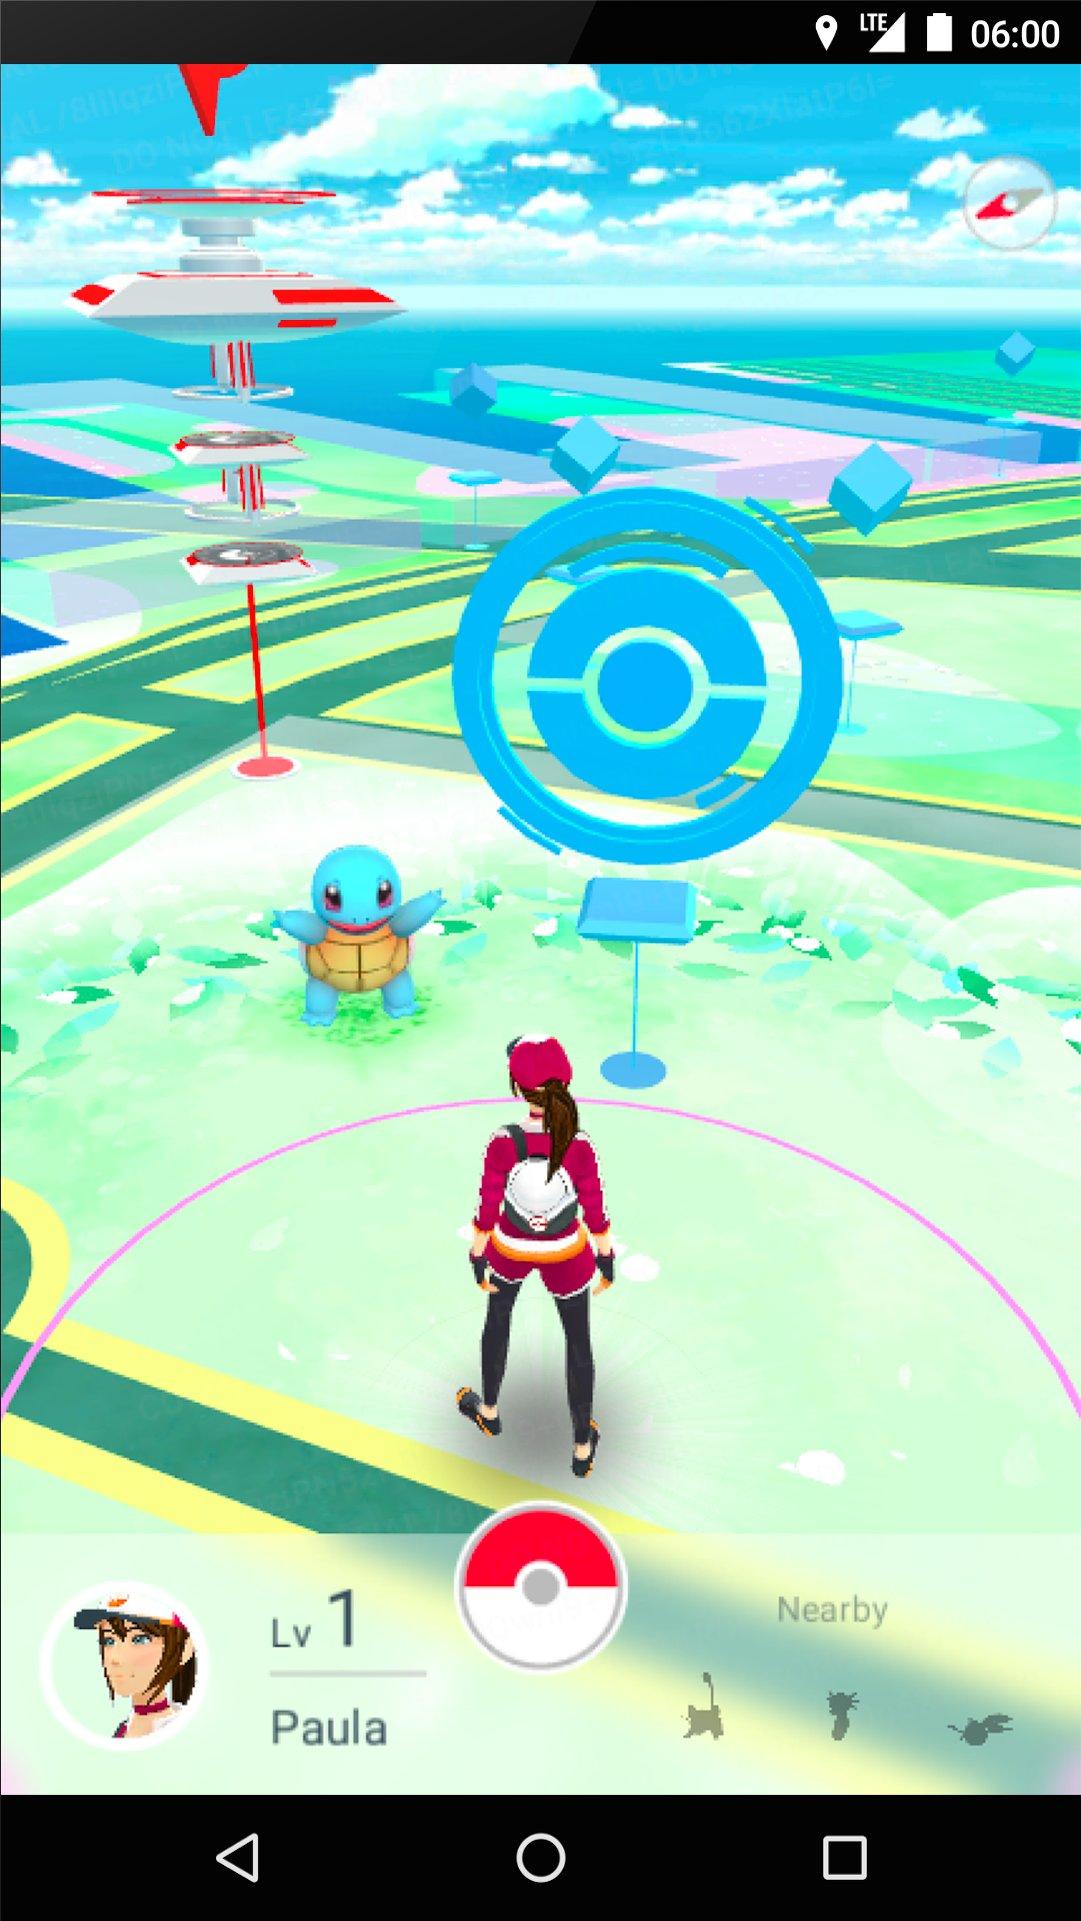 [I/A]Pokemon GO (172) 終於出Gen2!!! - Apps臺 - 香港高登討論區